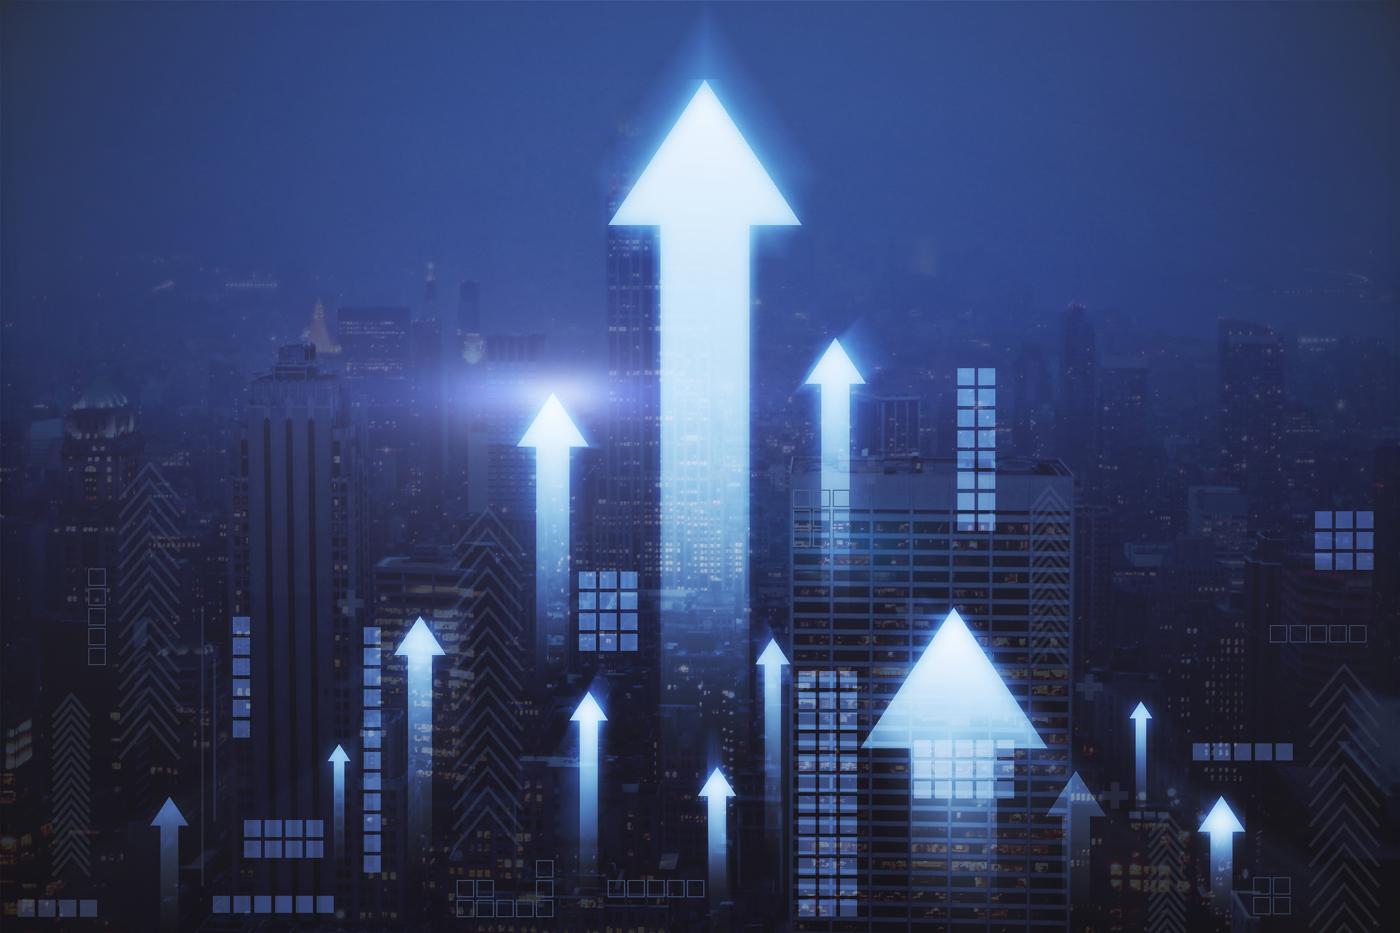 Stock price chart, stock chart, blue stock chart